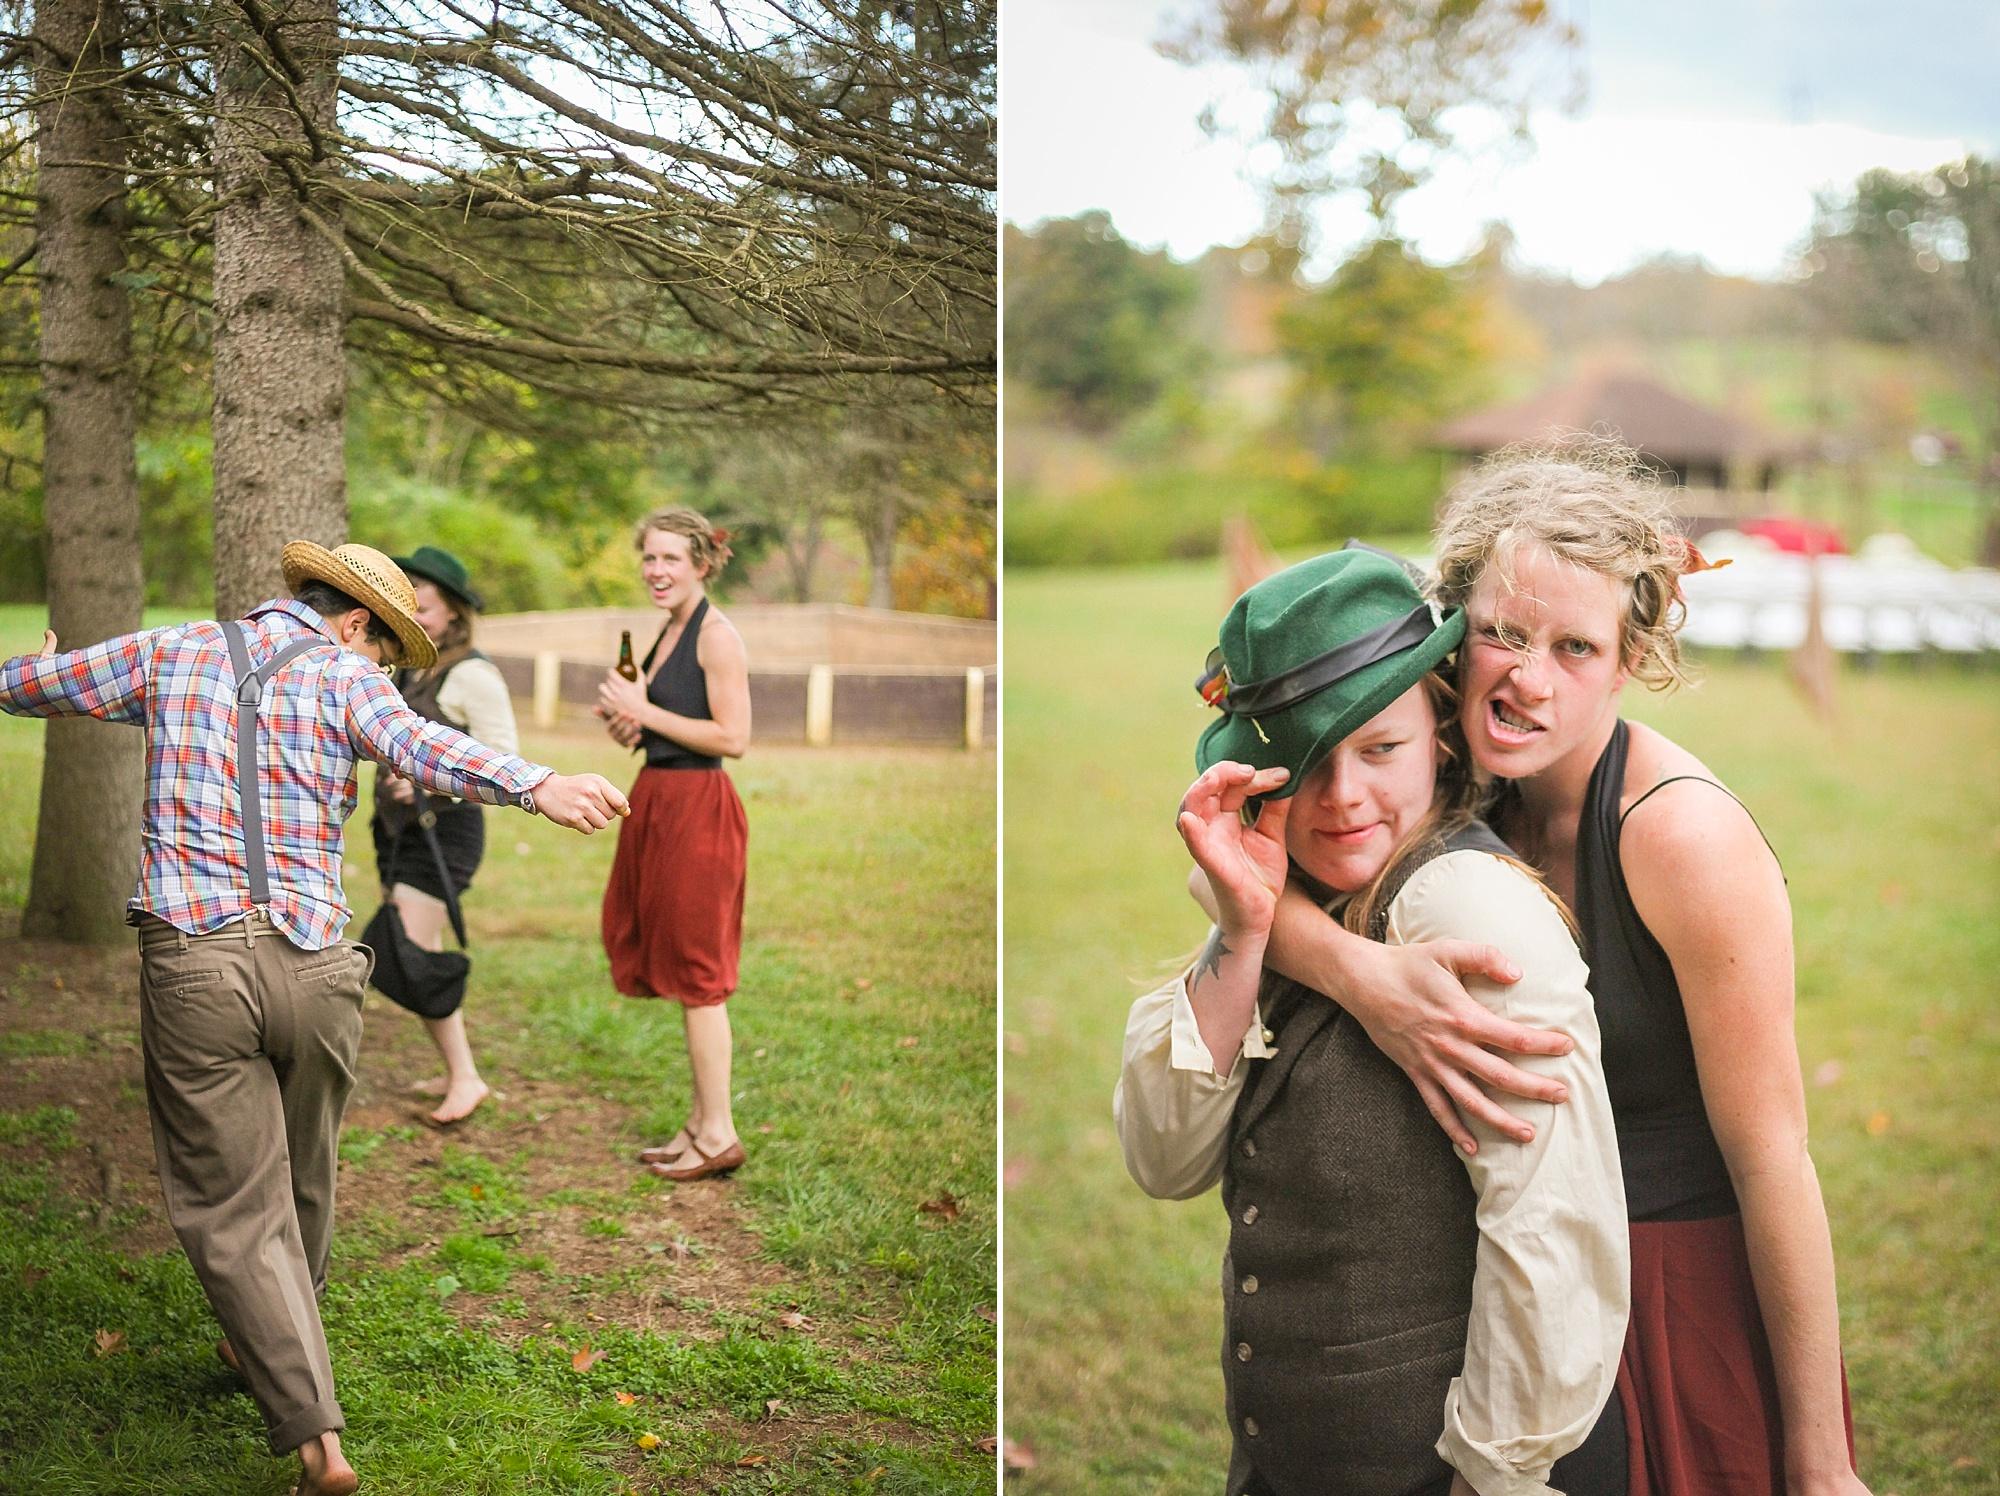 Joe_Mac_Creative_Mollie_and_Greg_Wedding_Photography_0018.jpg